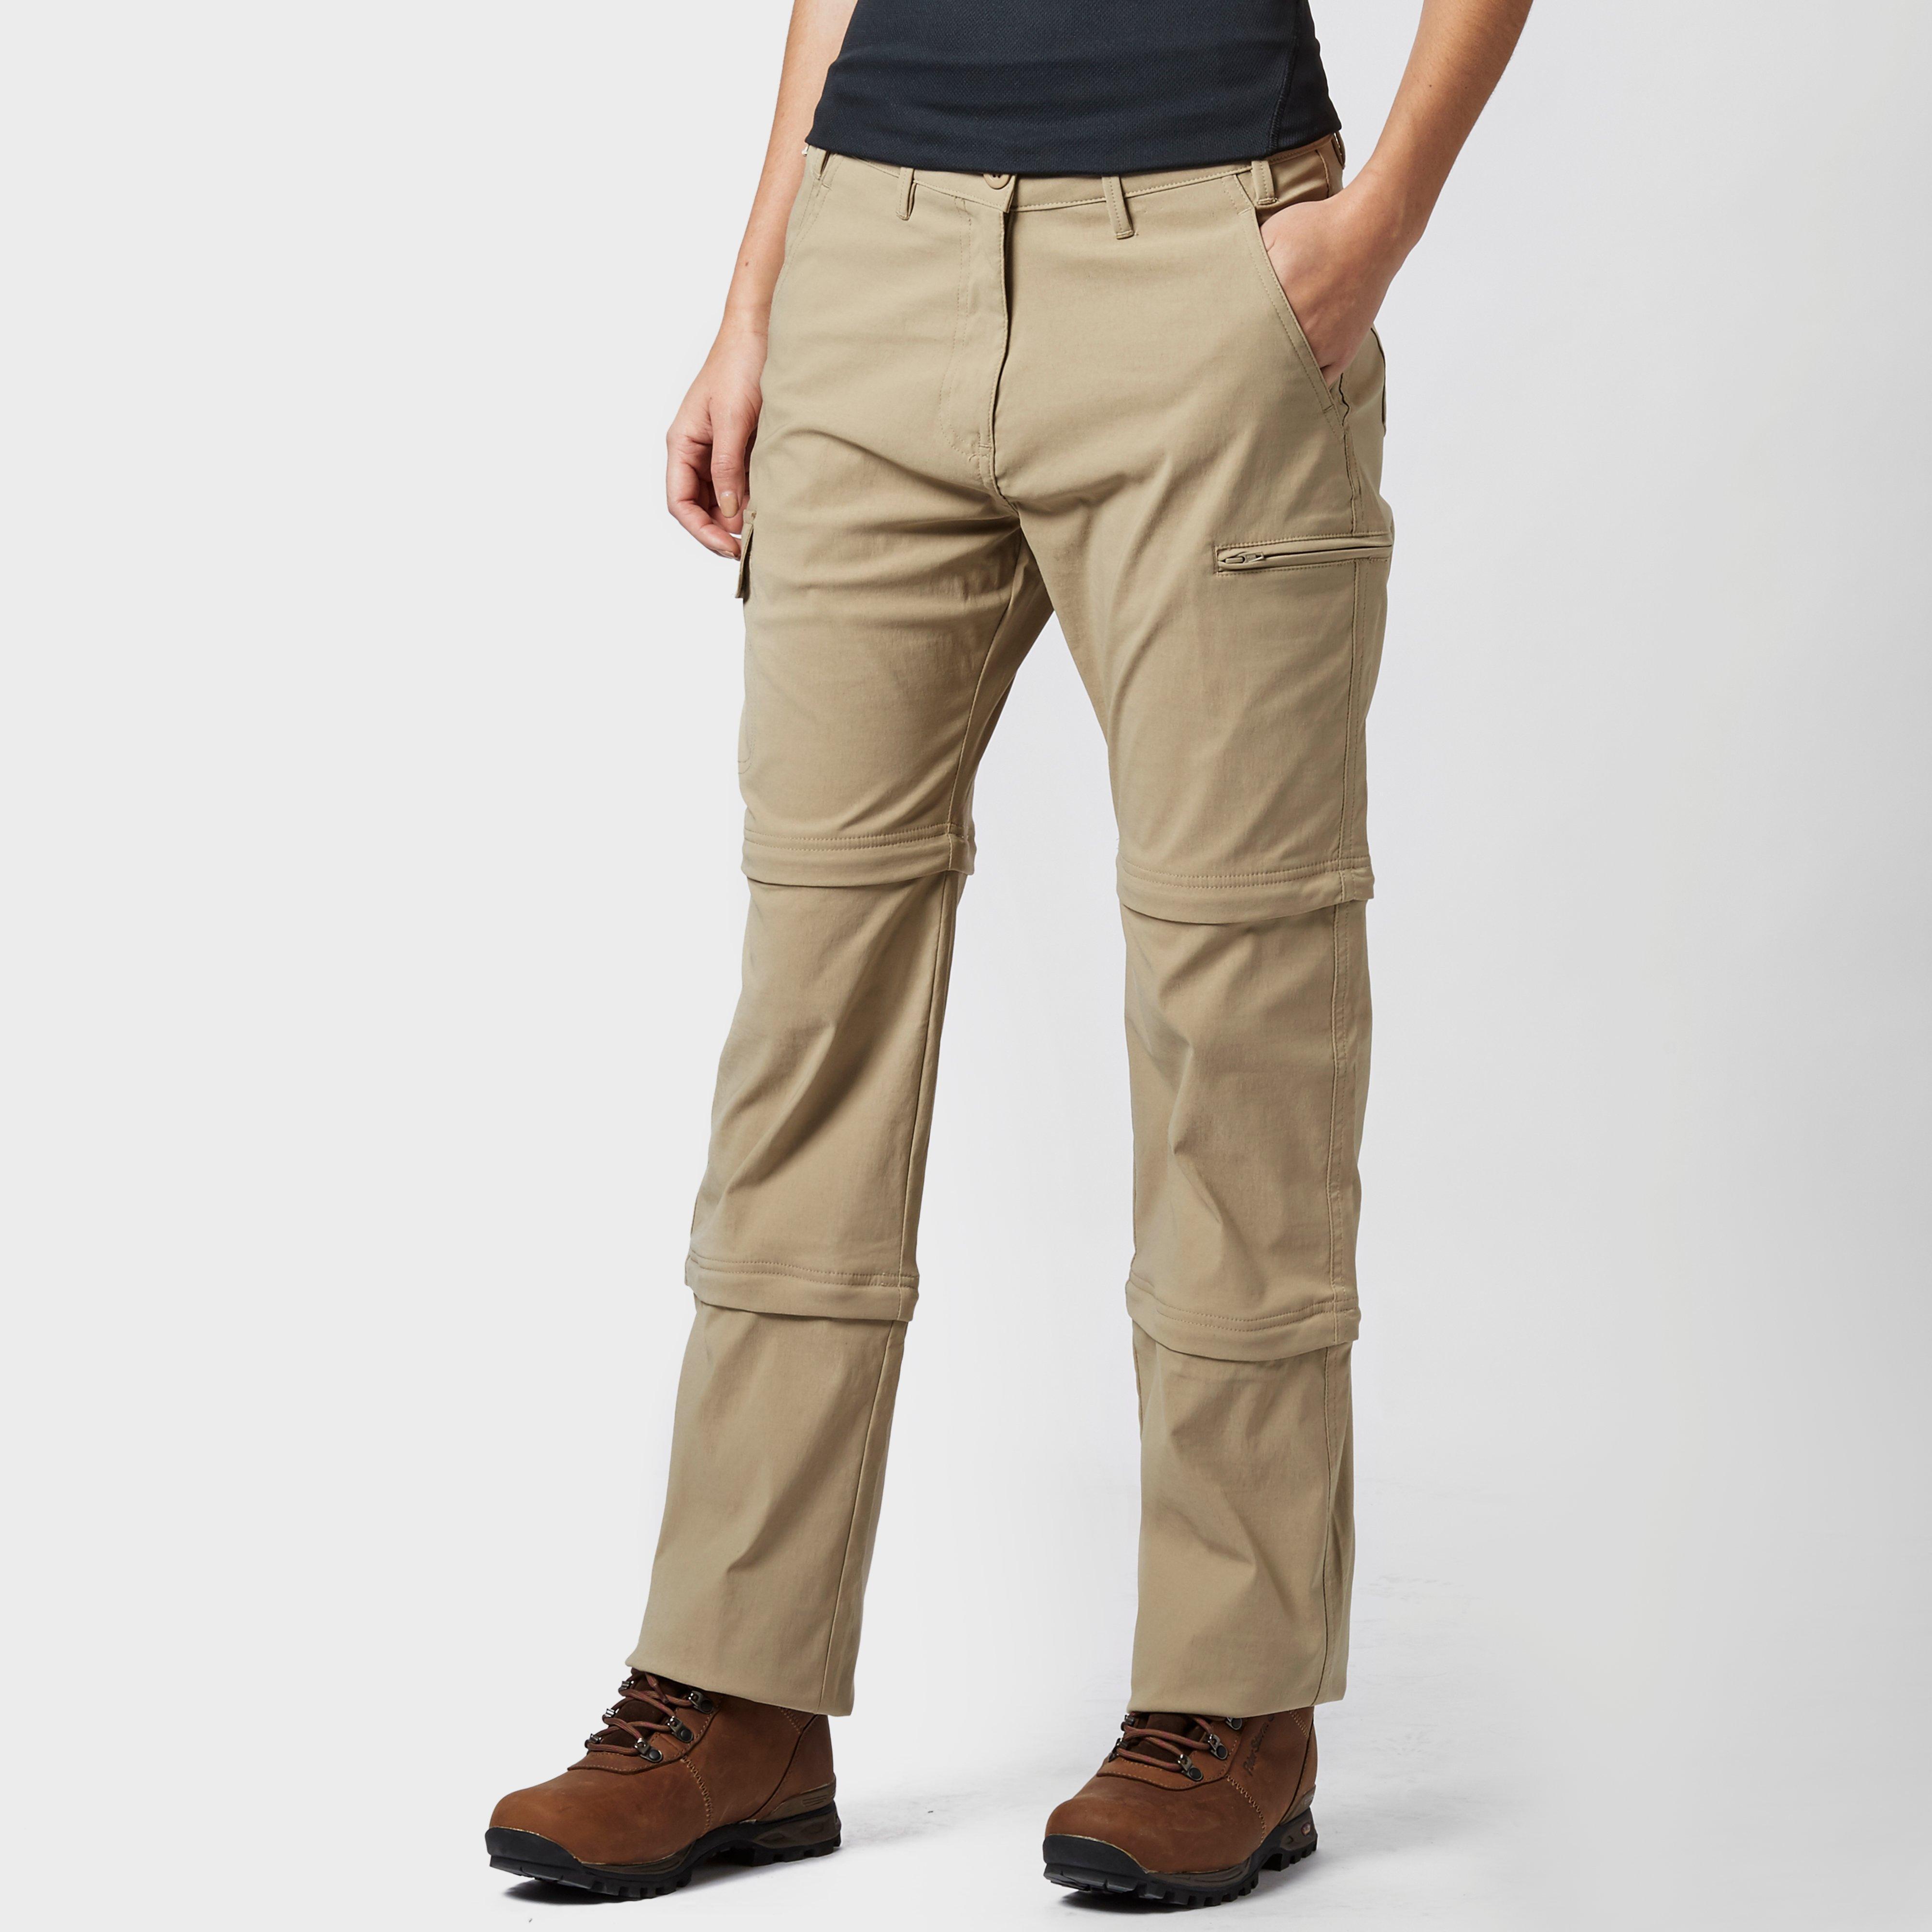 Peter Storm Peter Storm womens Stretch Double Zip Off Trousers - Long - Beige, Beige